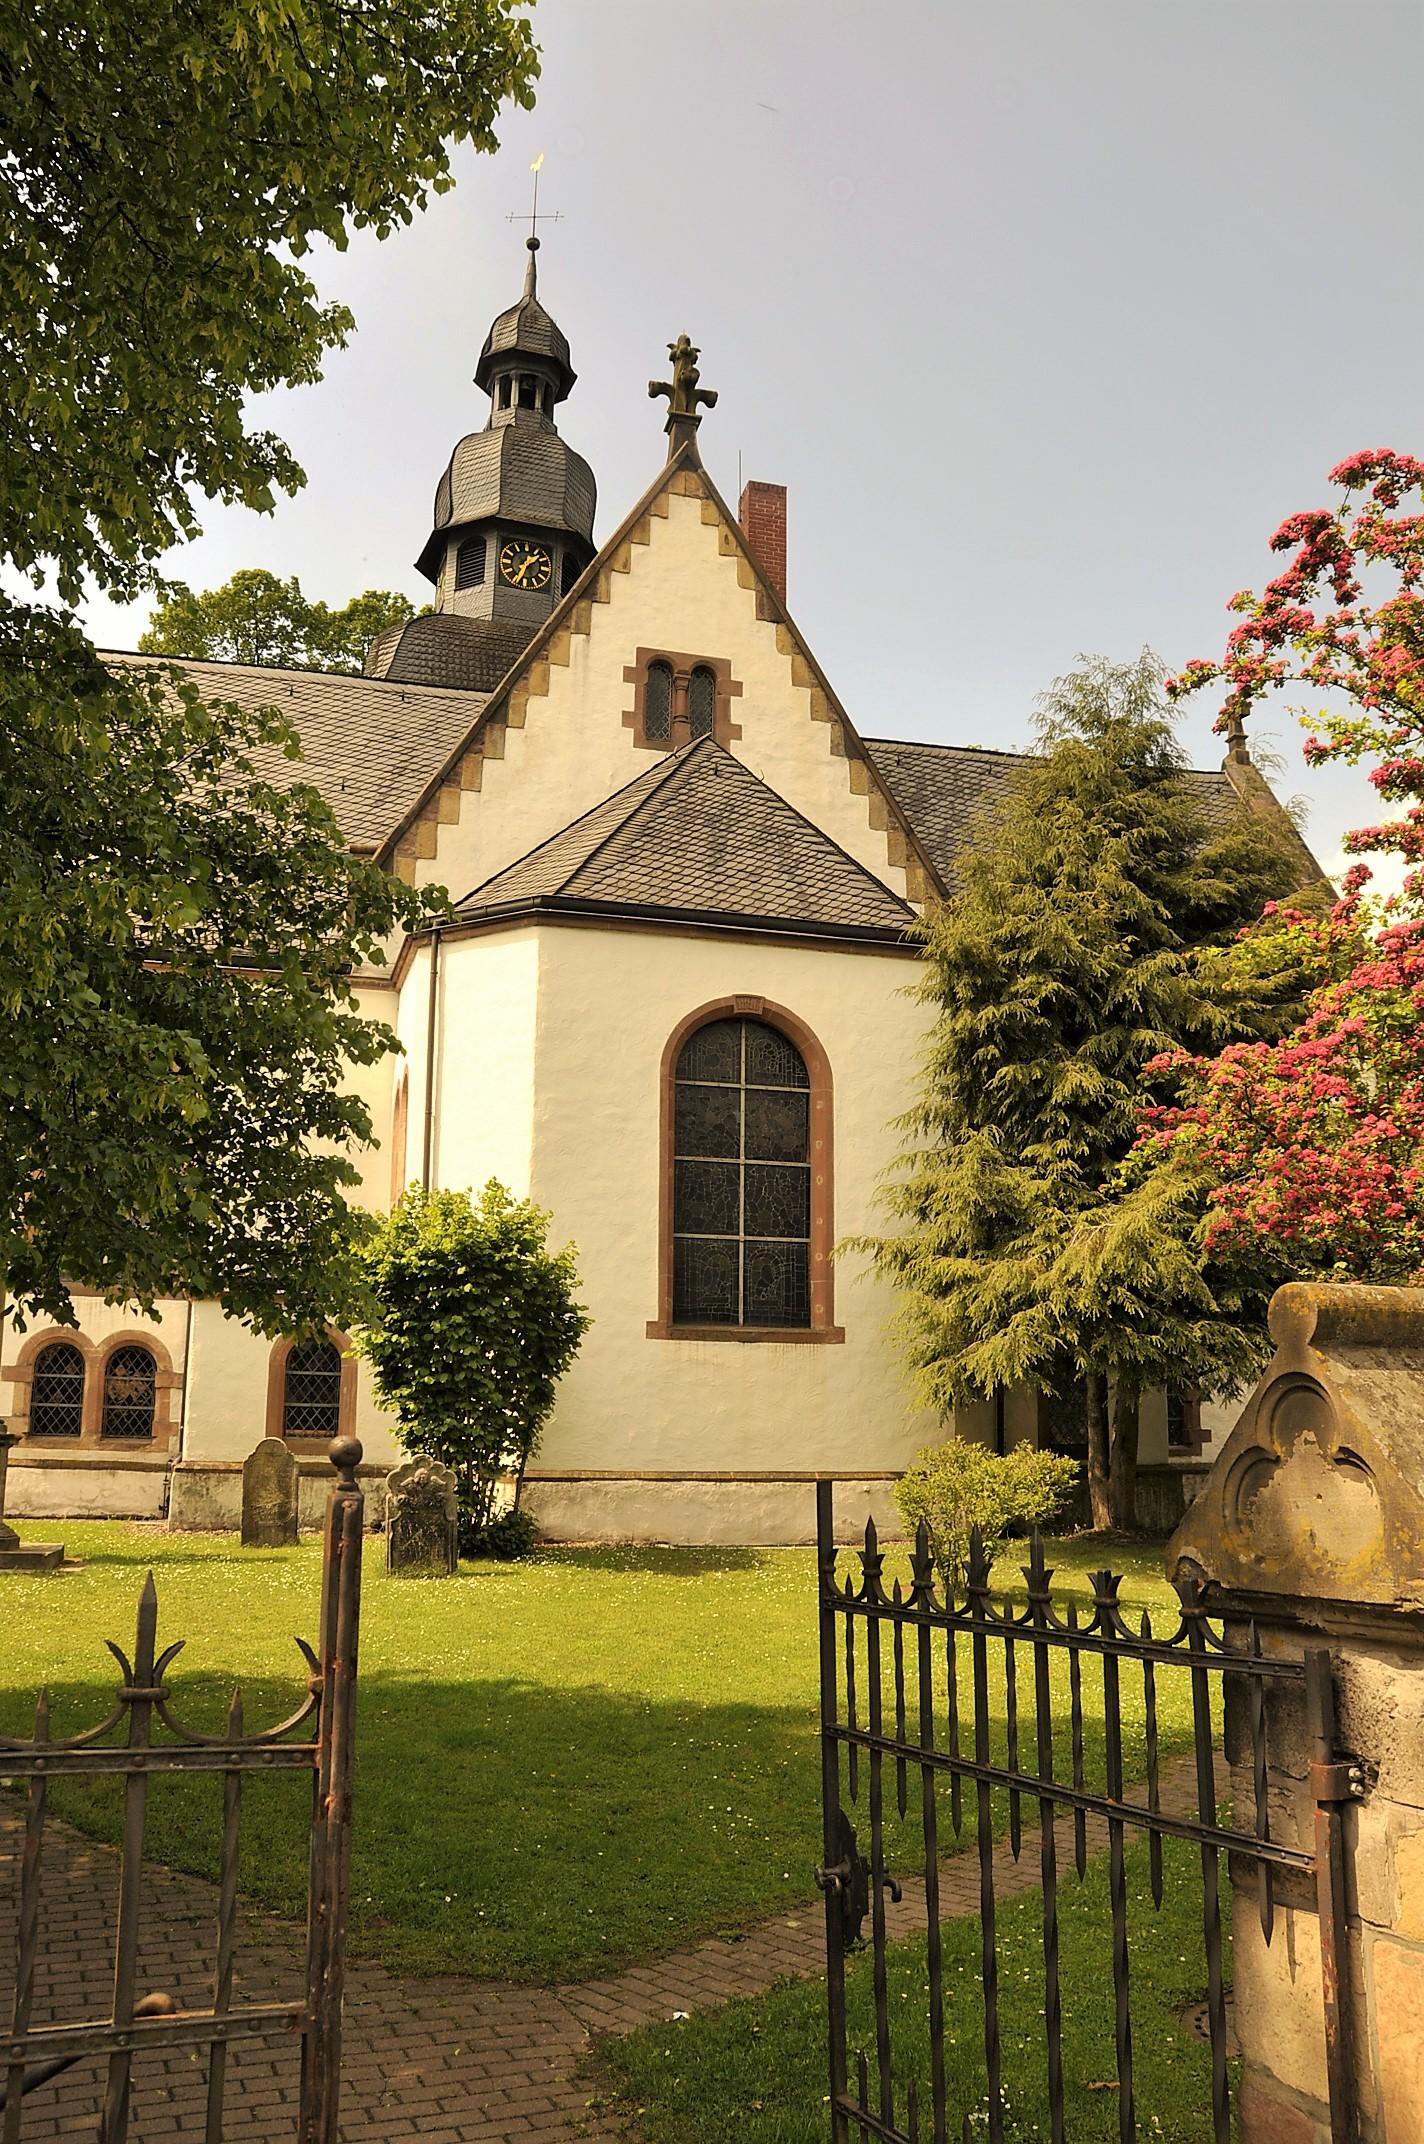 bibelschule brake adresse